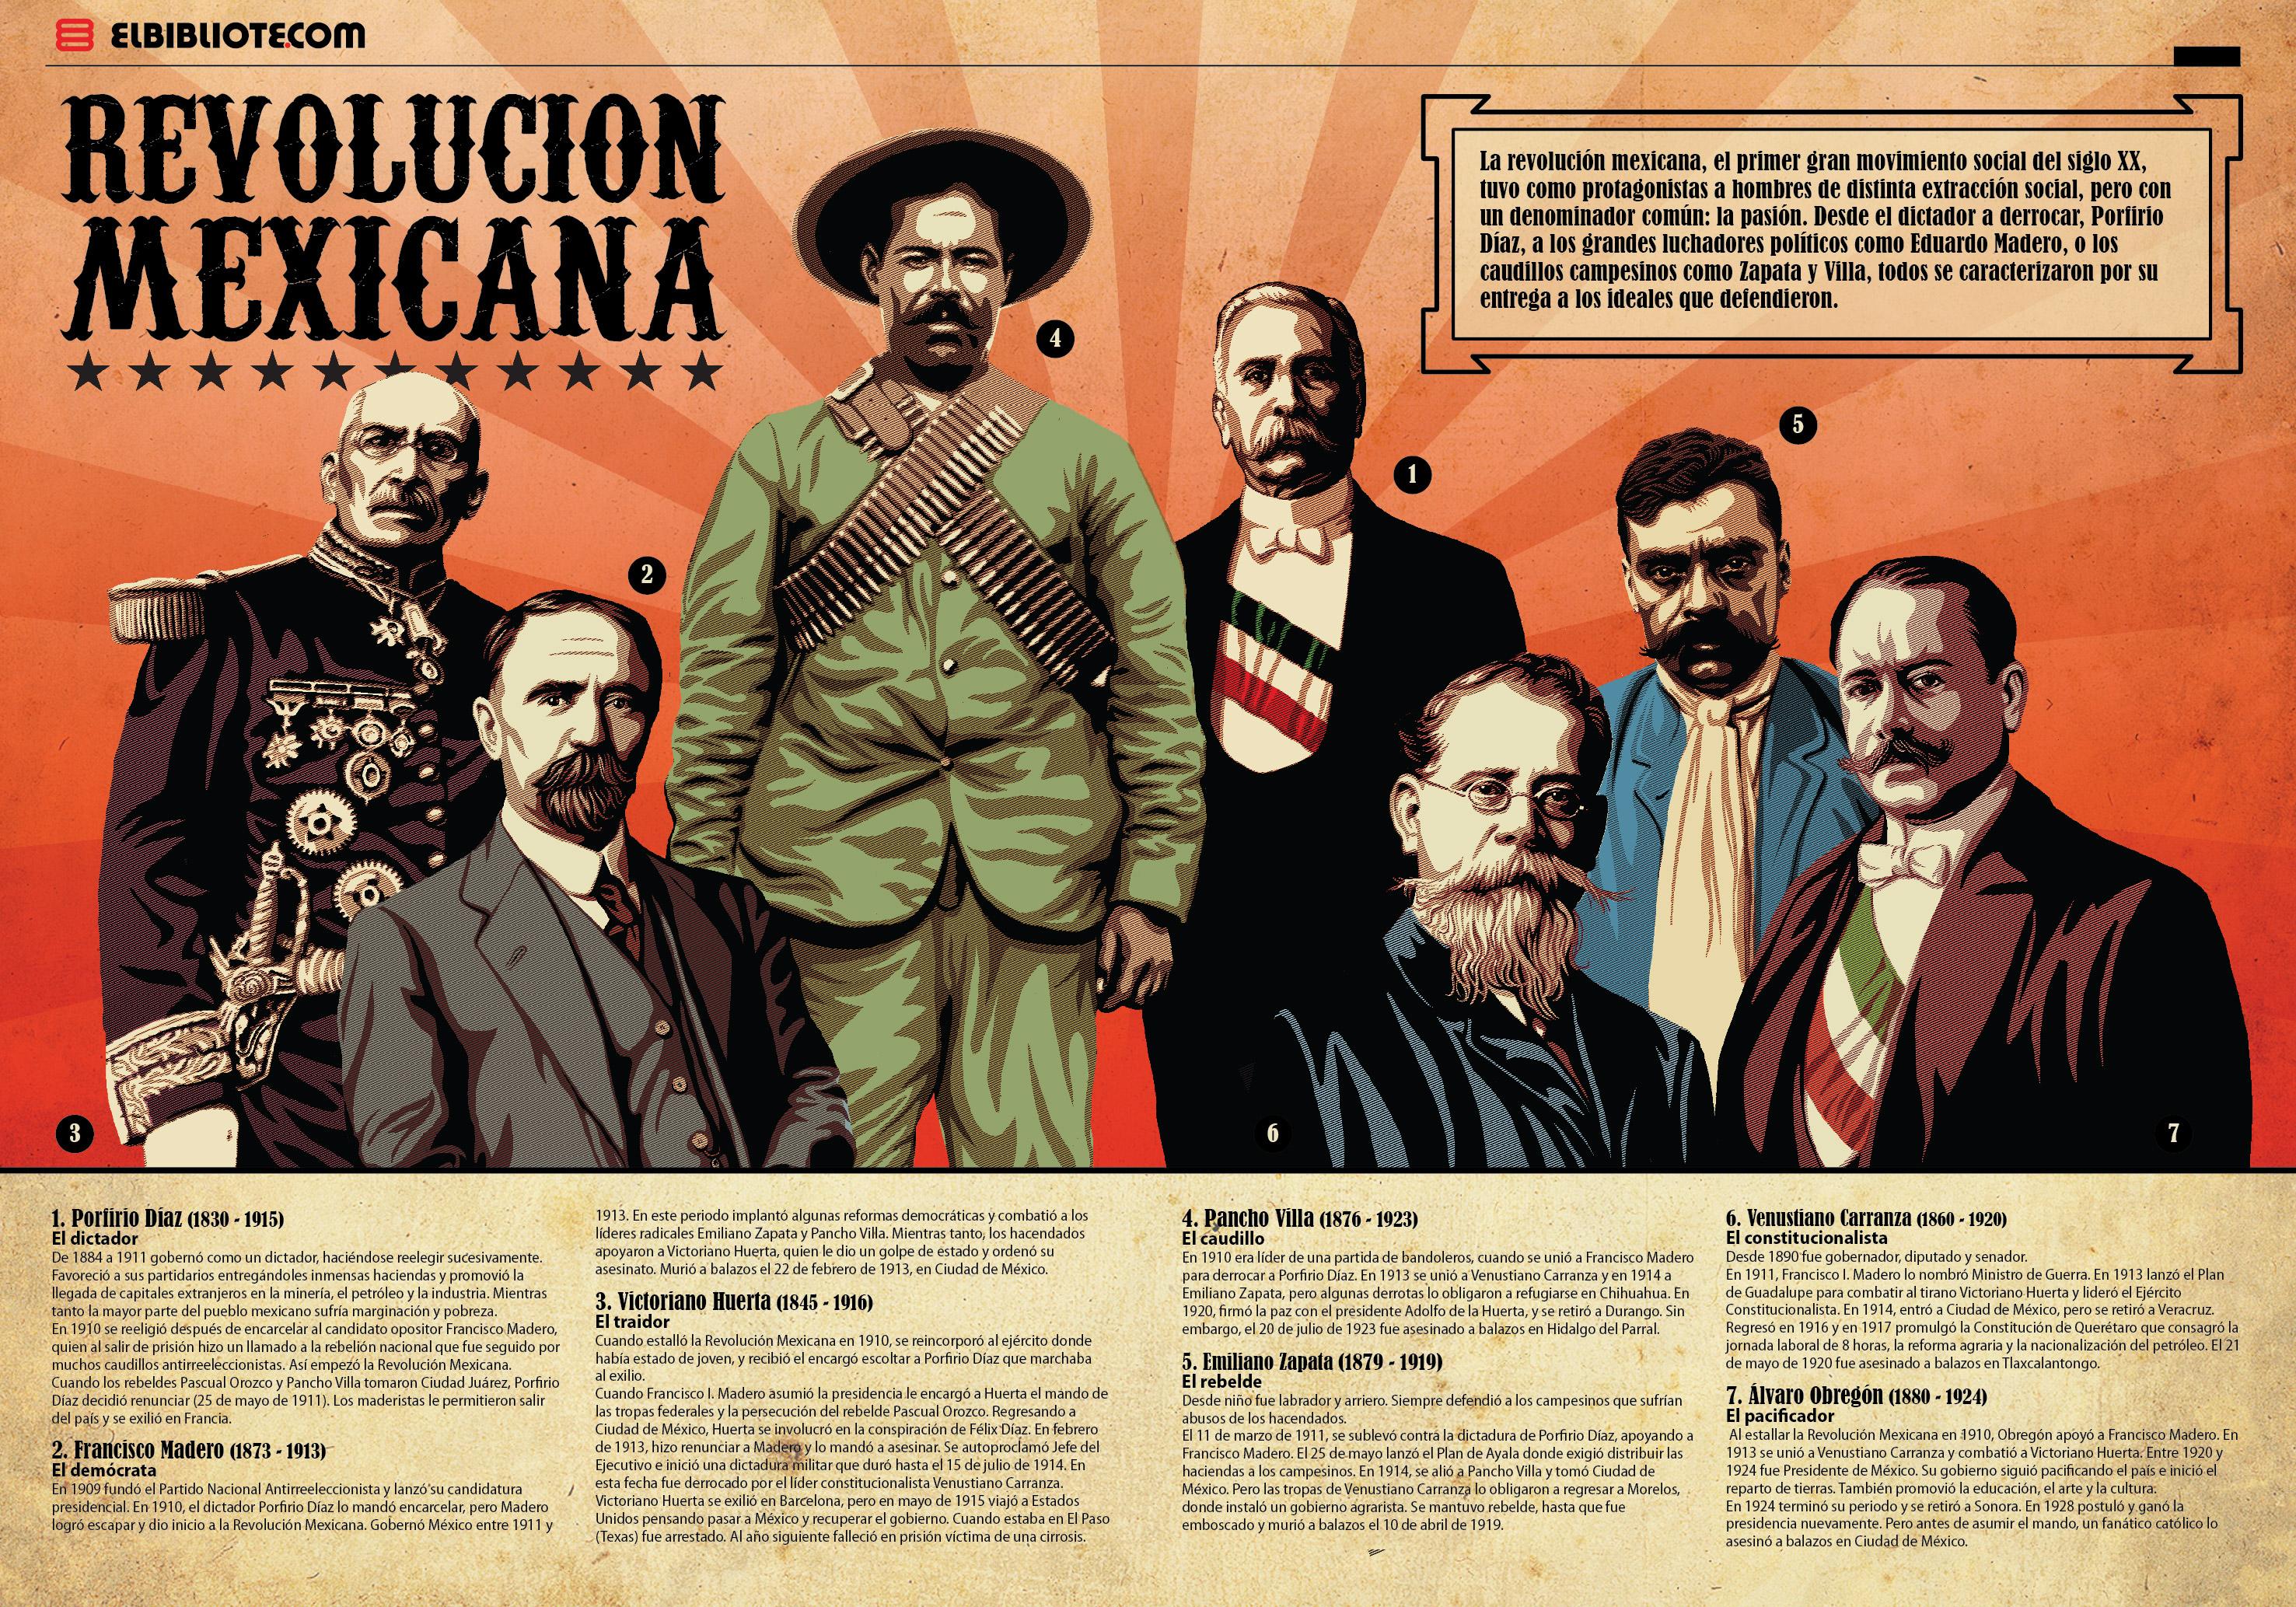 Fotos de la revolucion mexicana de 1910 34